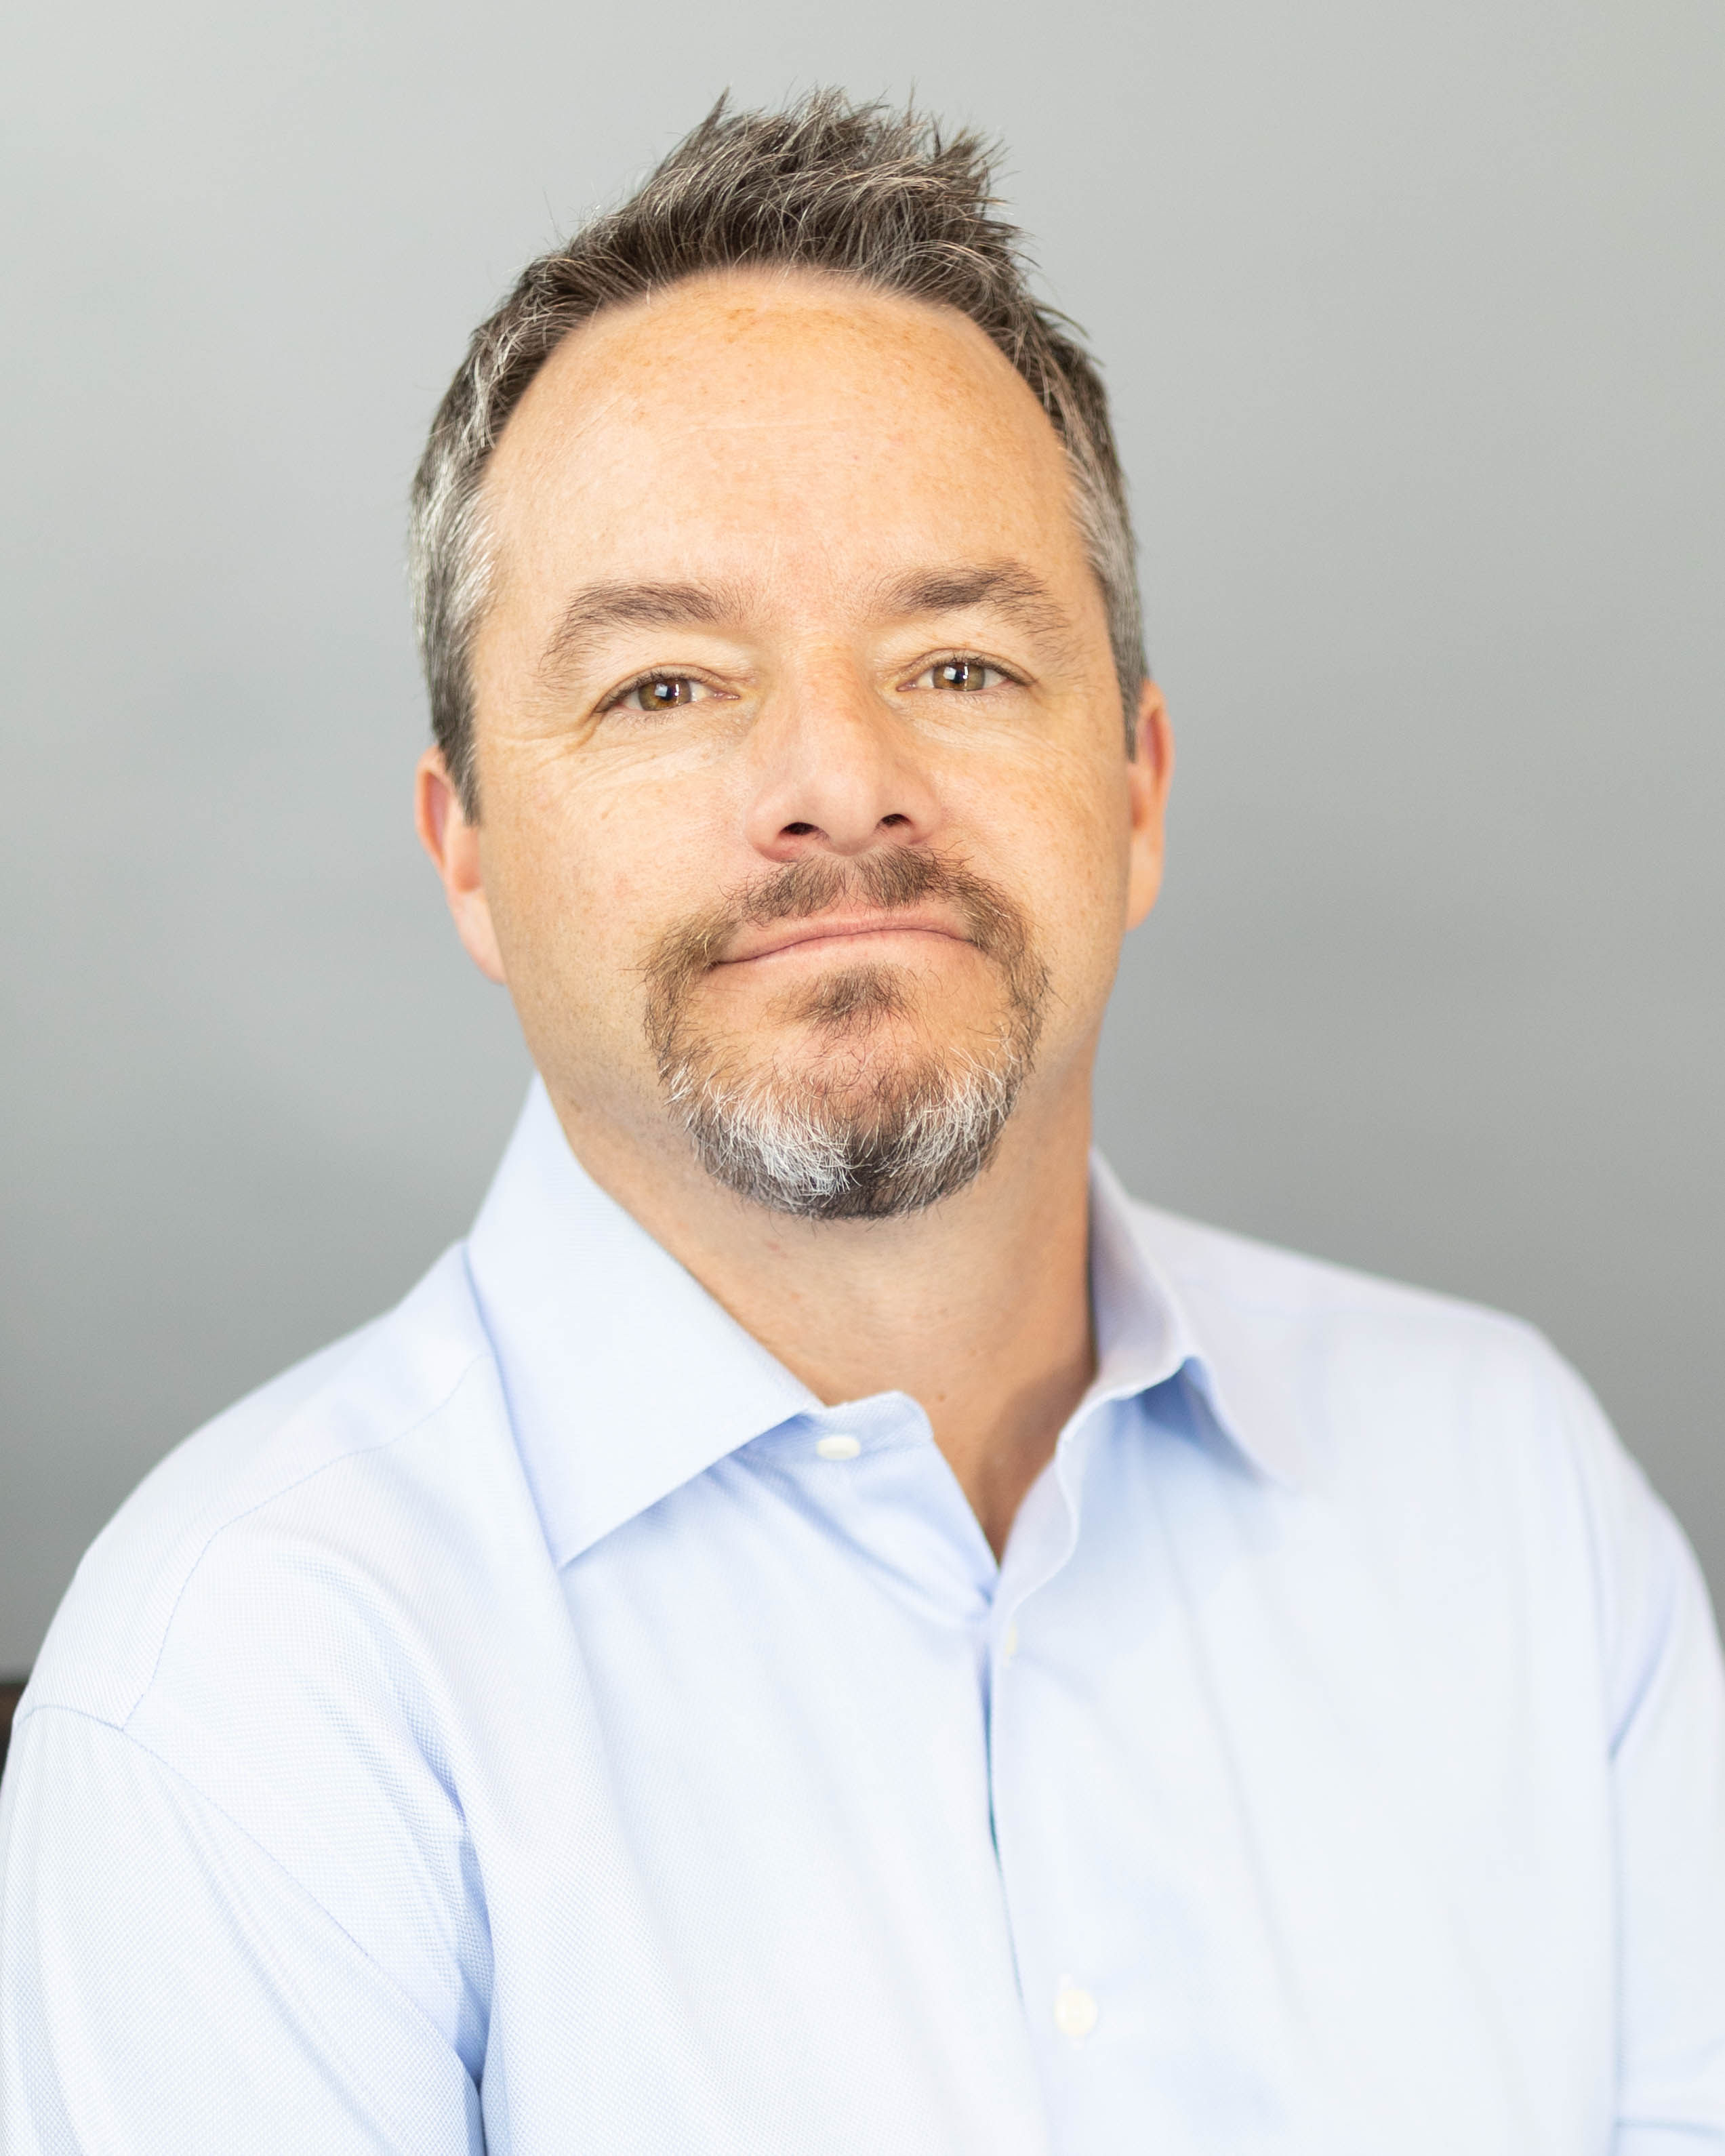 Daniel Sogorka